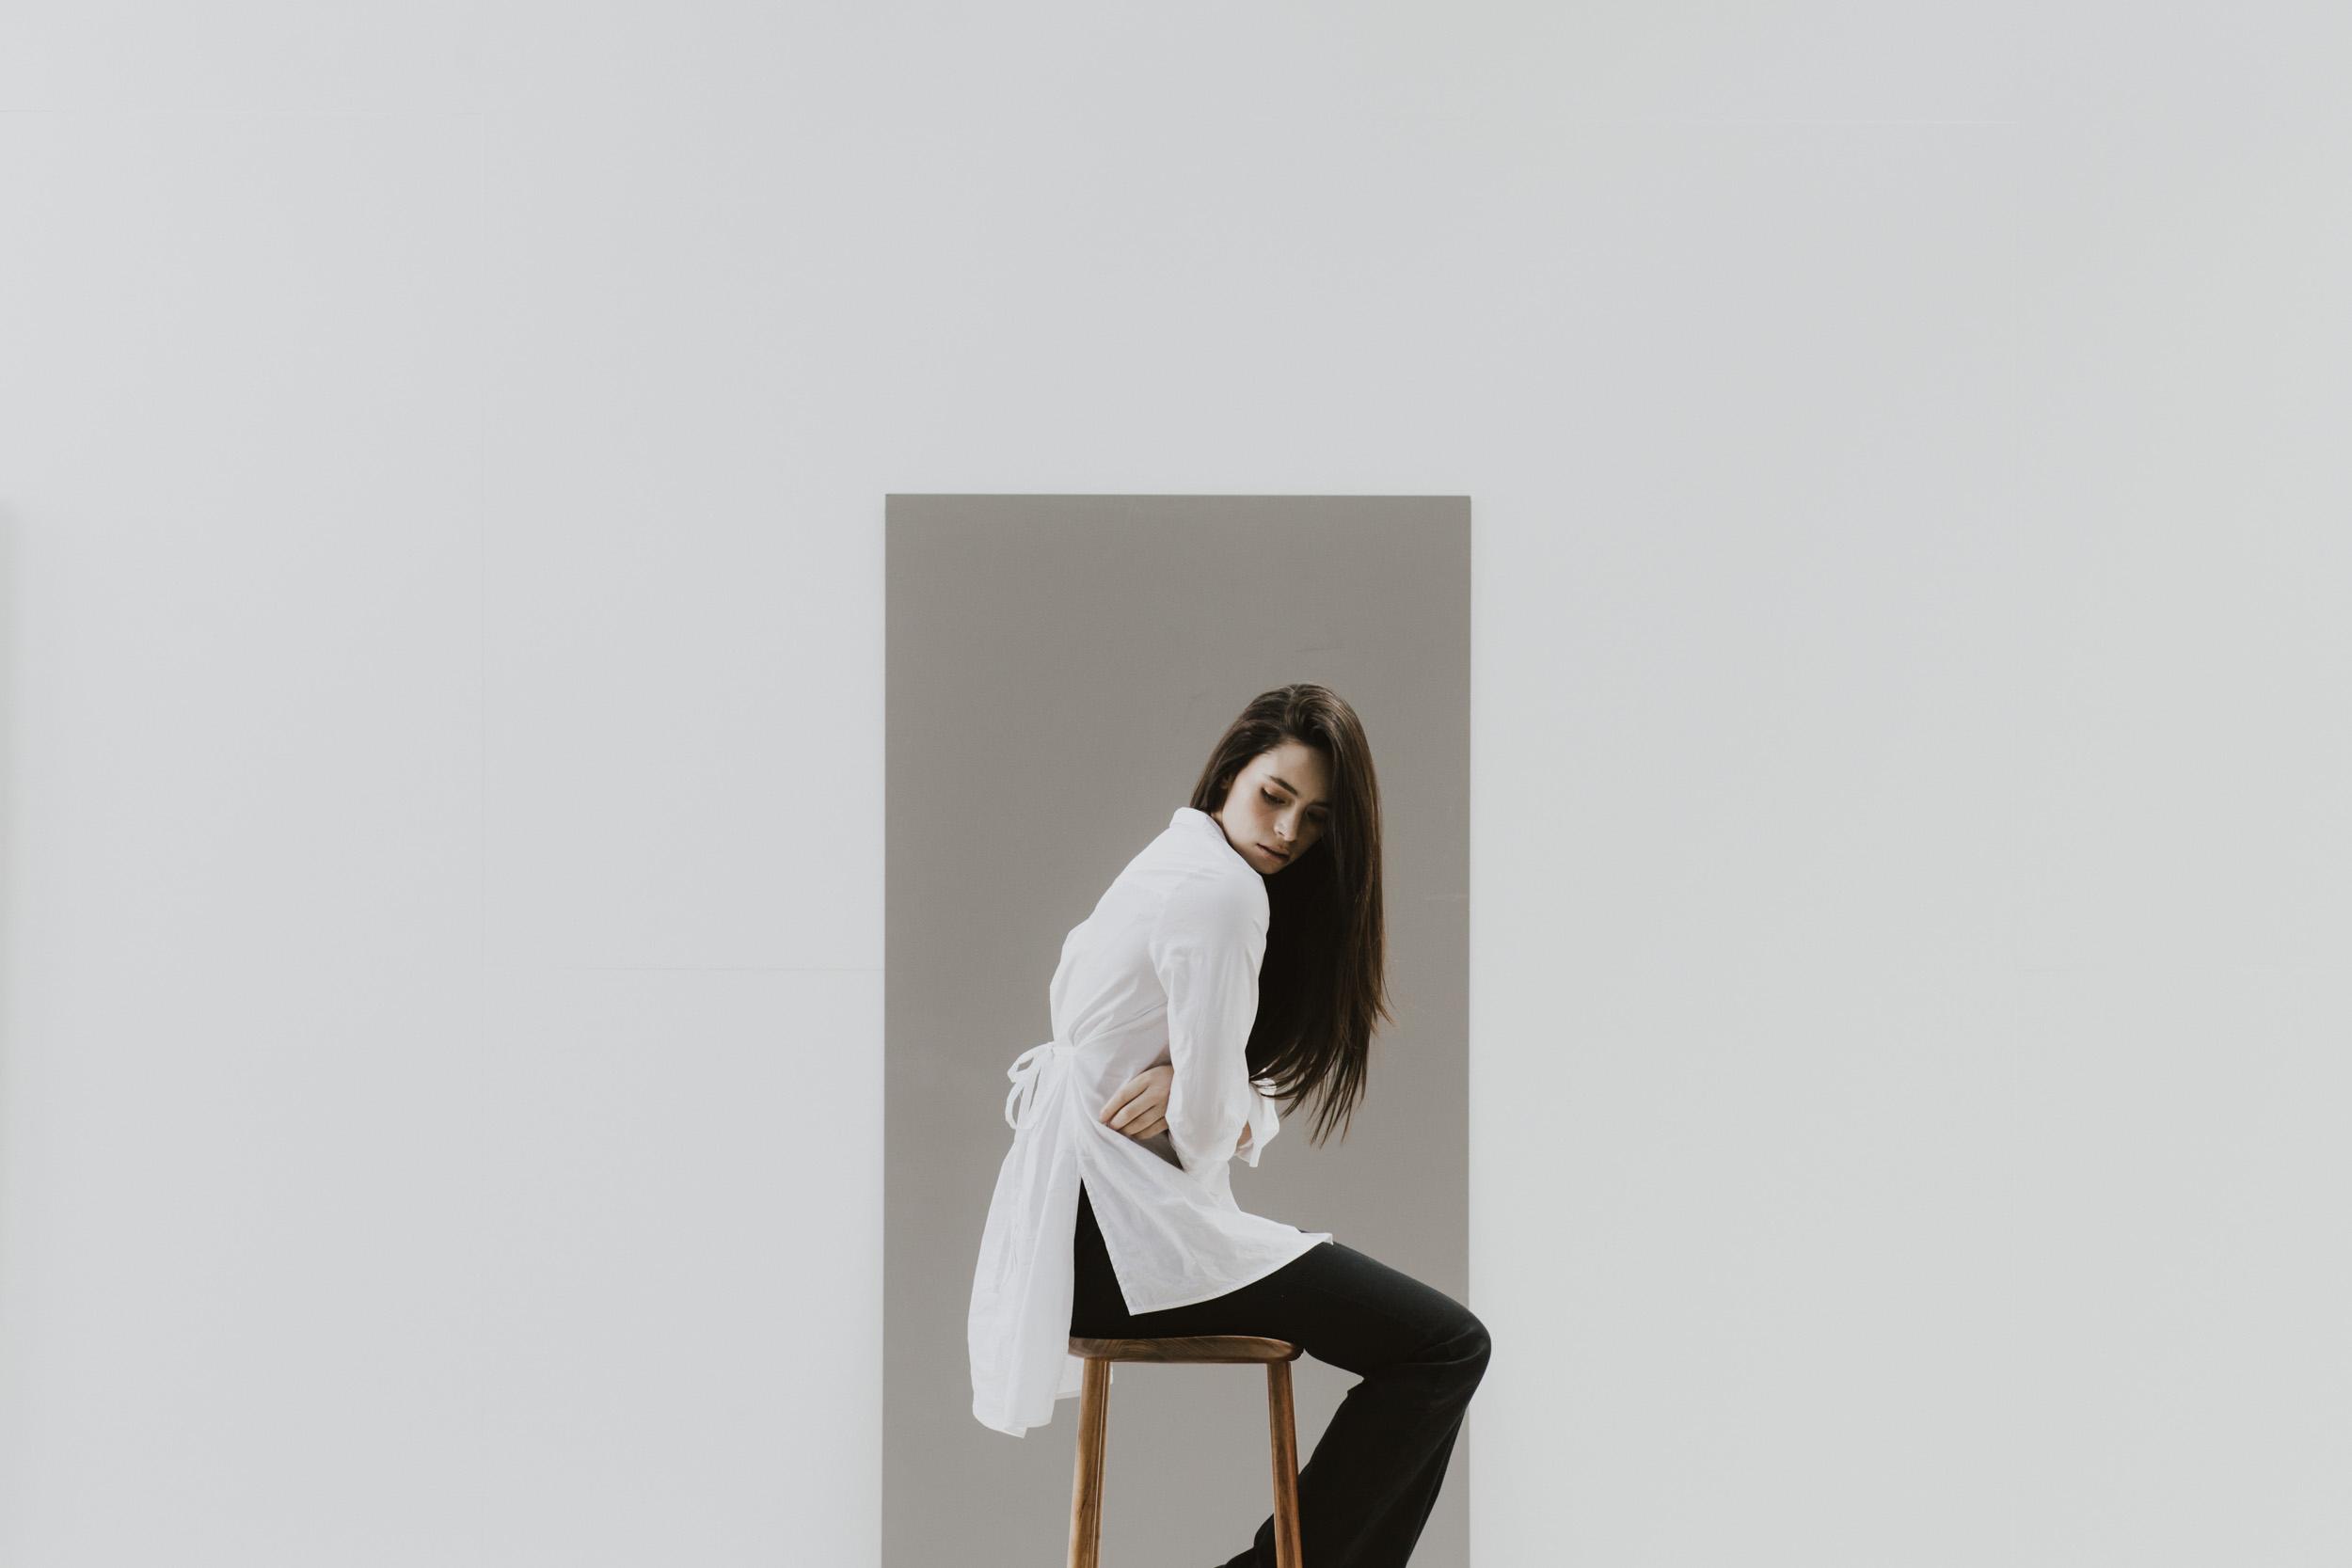 Furniture design minimalist editorial by Jenny Wu